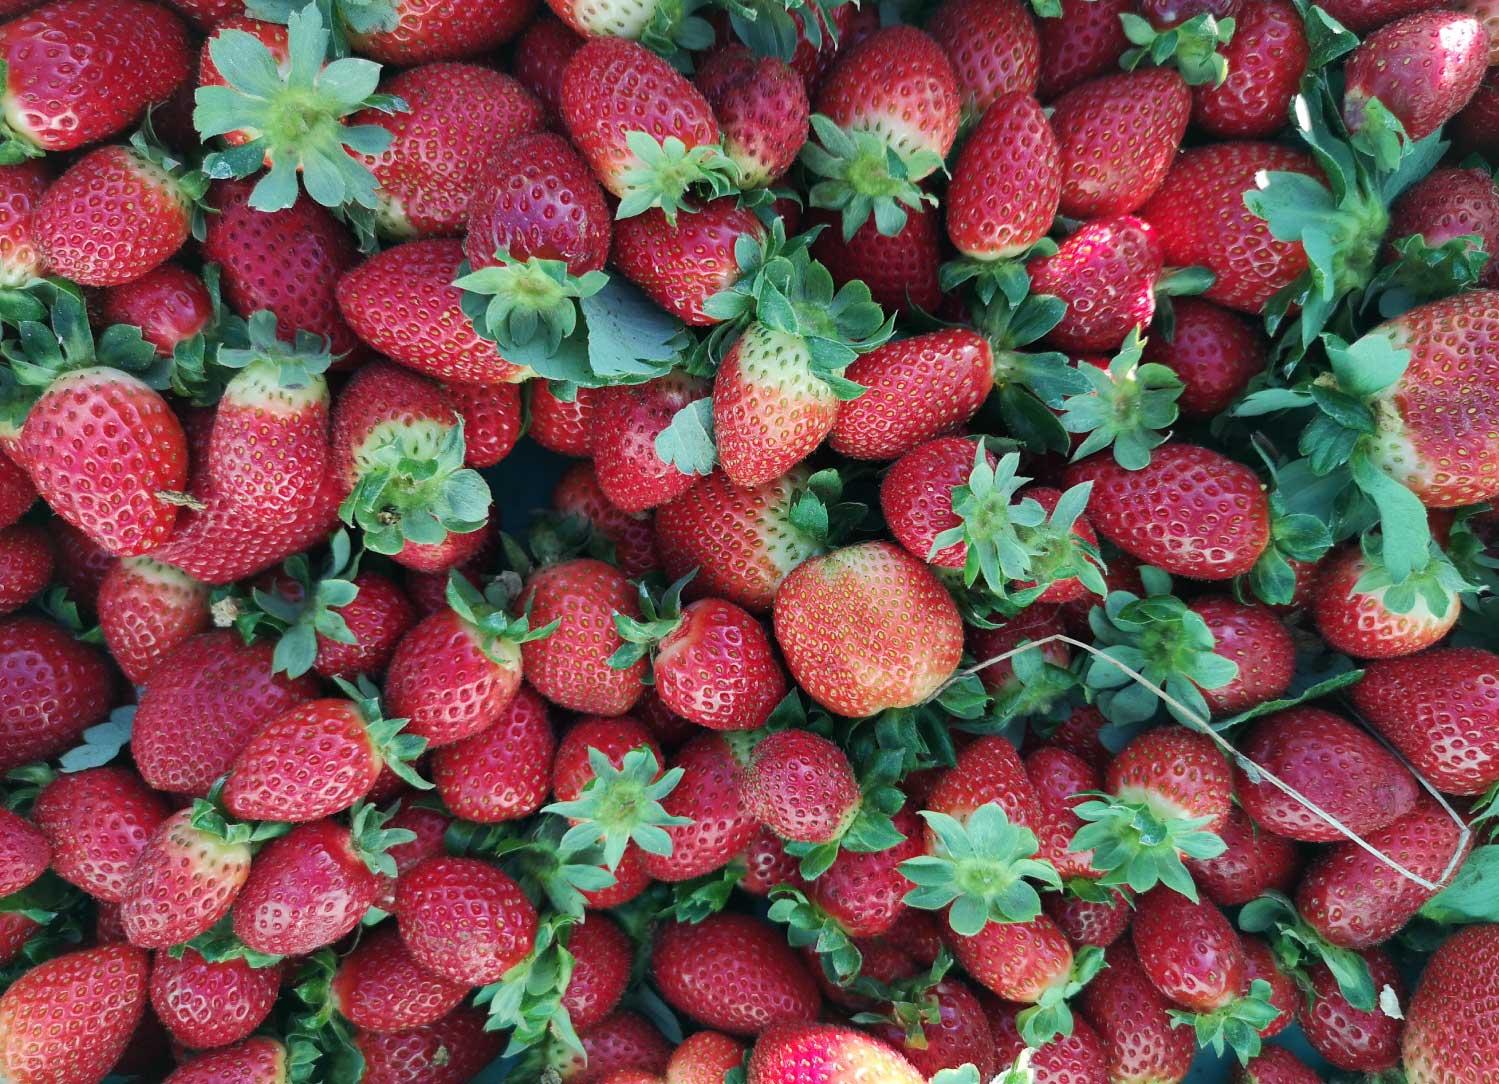 strawberries-fresh-malta-7-health-benefits-mgarr